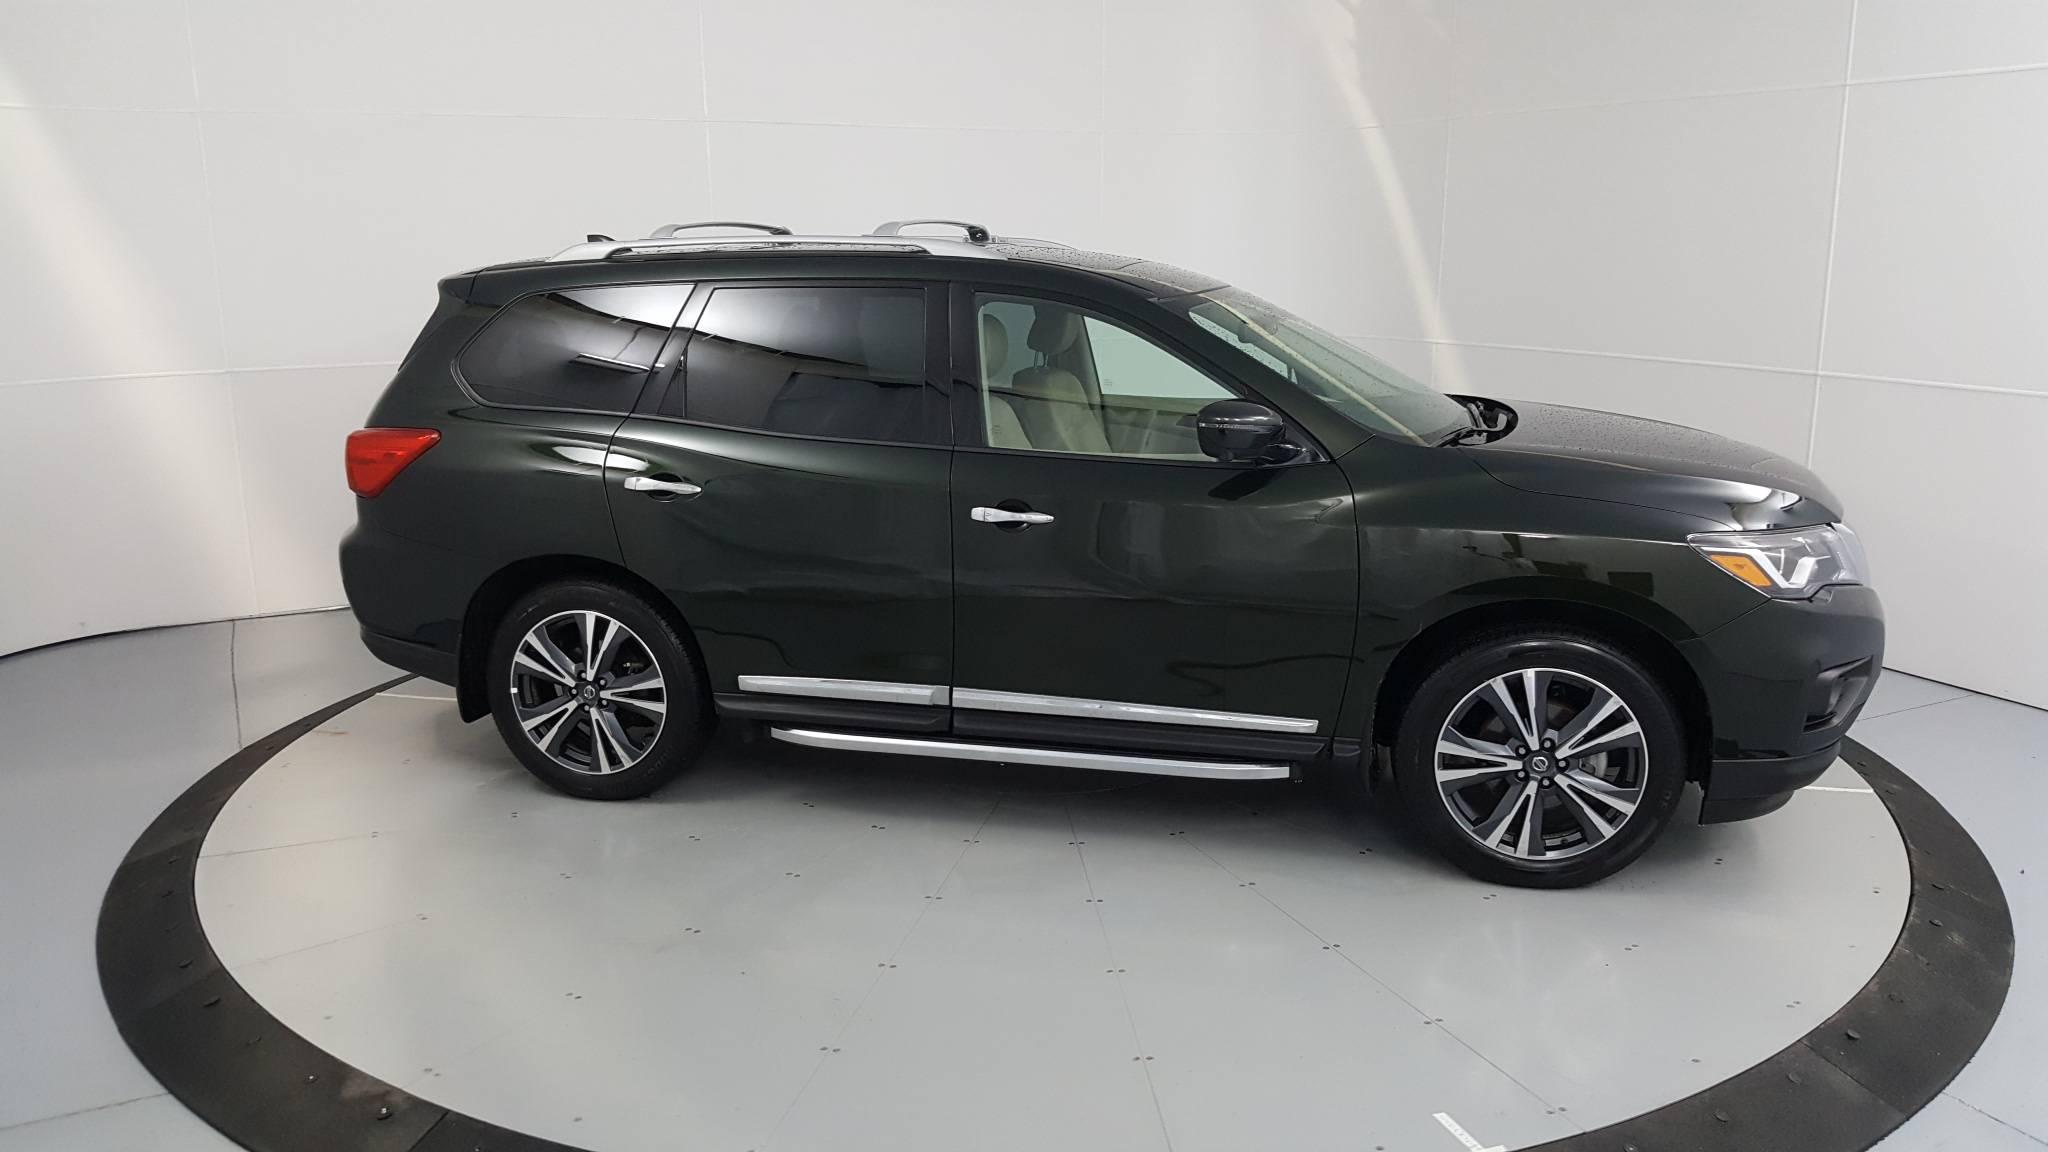 2020 Nissan Pathfinder Sport Utility